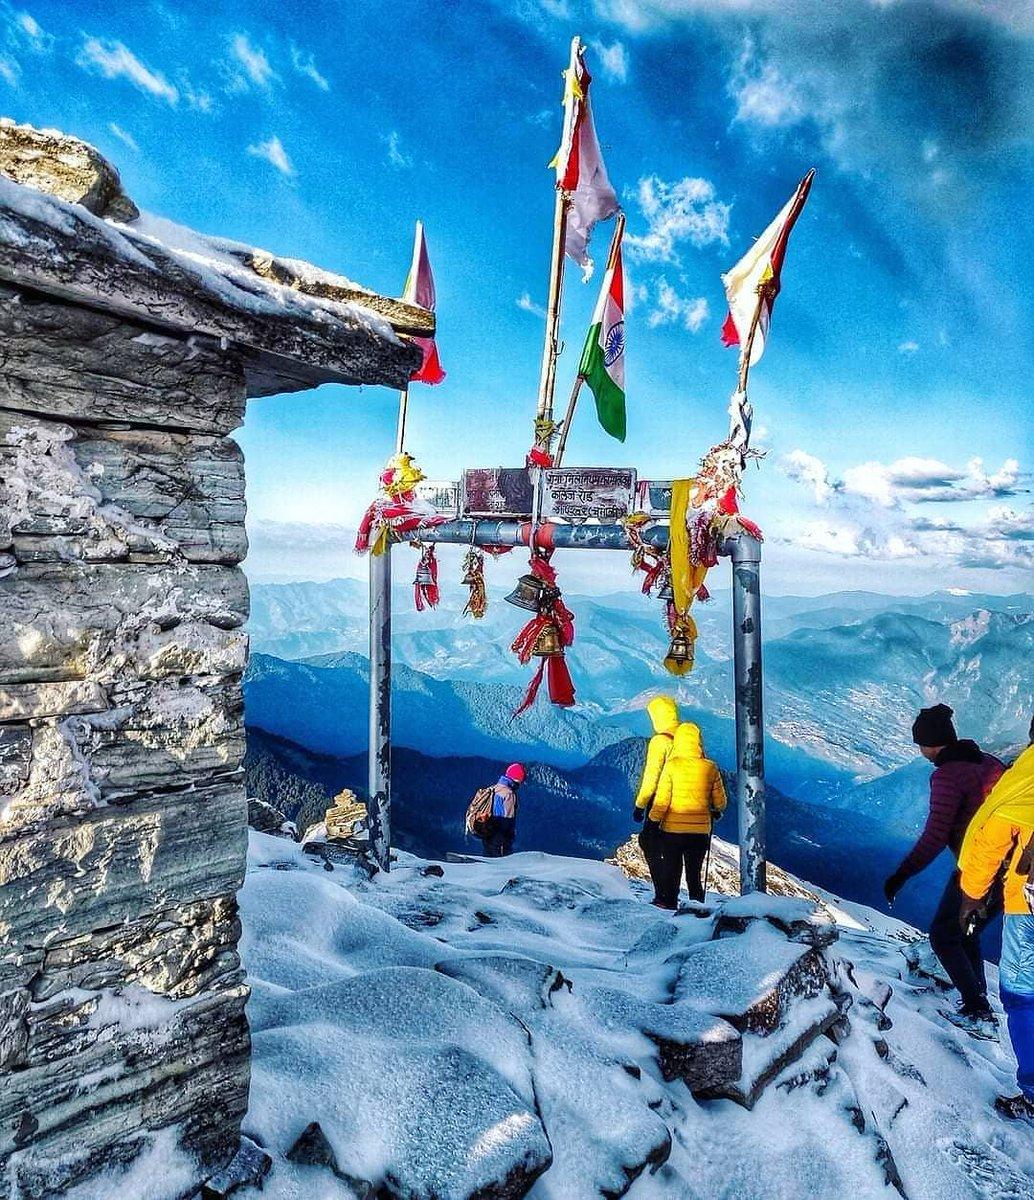 Chandrashila Trek ❤️ . . Photo by Cc - Instagram ID- @himachal_a_heaven Location - Chandrashila चन्द्रशिला  #himachal_a_heaven⠀ #chitkul #kinnaur #himalayas #himgeo #beautifulkinnaur #incrediblekinnaur #himachal #himachalpradesh #himachaldiaries #beautifulhimachal https://t.co/5W5BTH40Ag